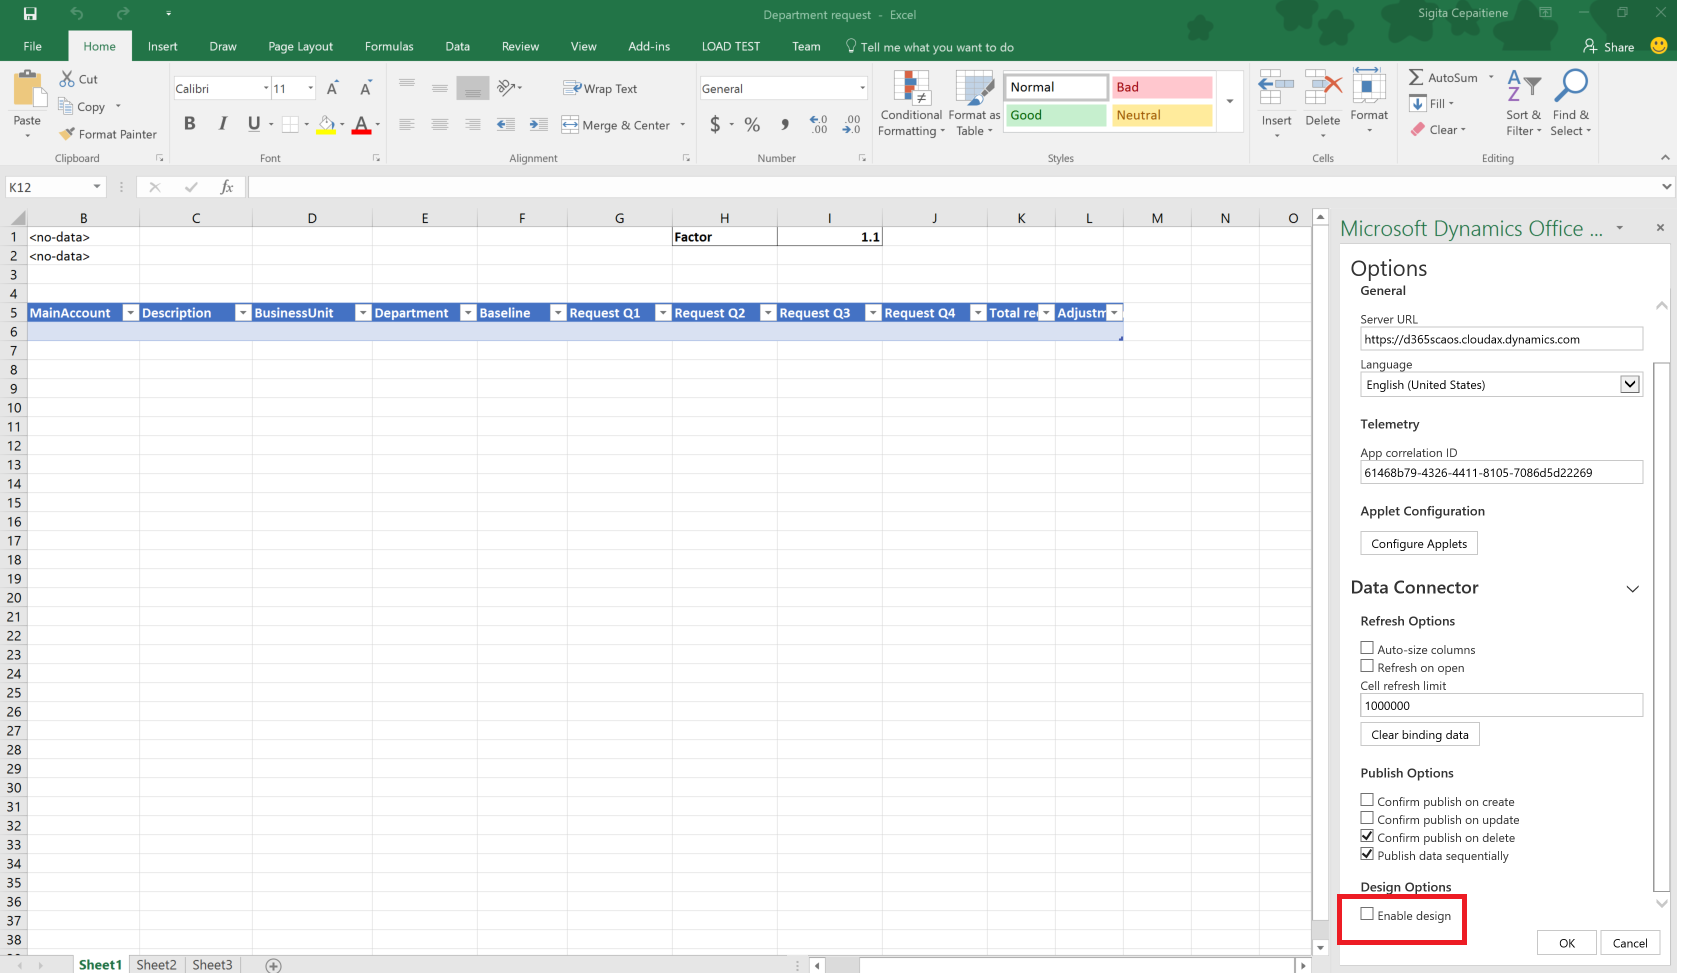 Budgetplanungsvorlage für Excel - Finance & Operations | Dynamics ...